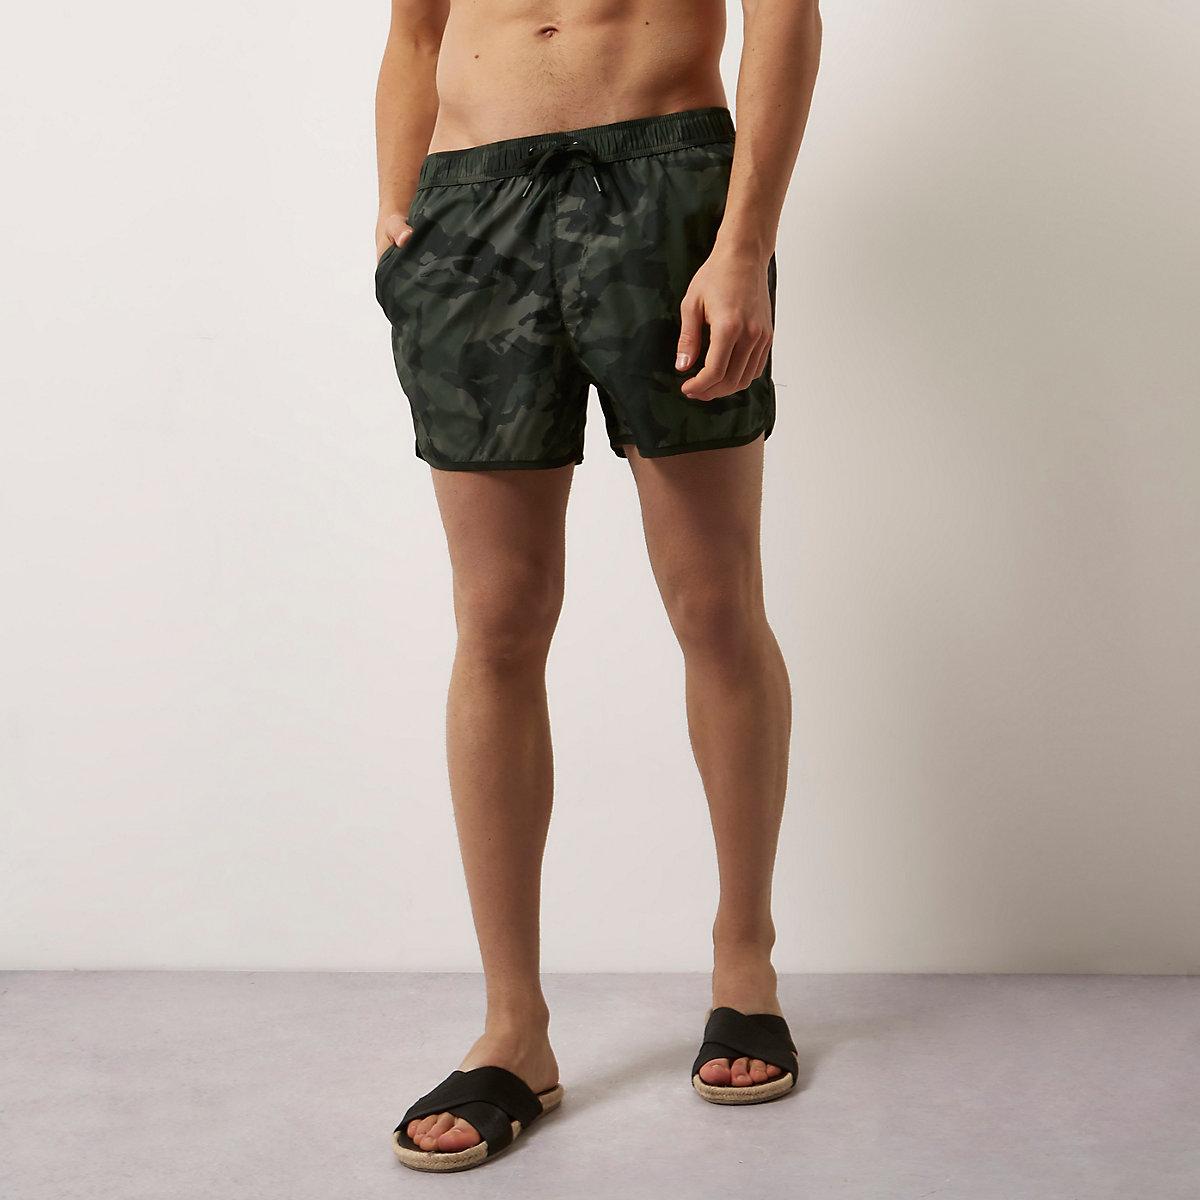 Dark green camo print short swim shorts